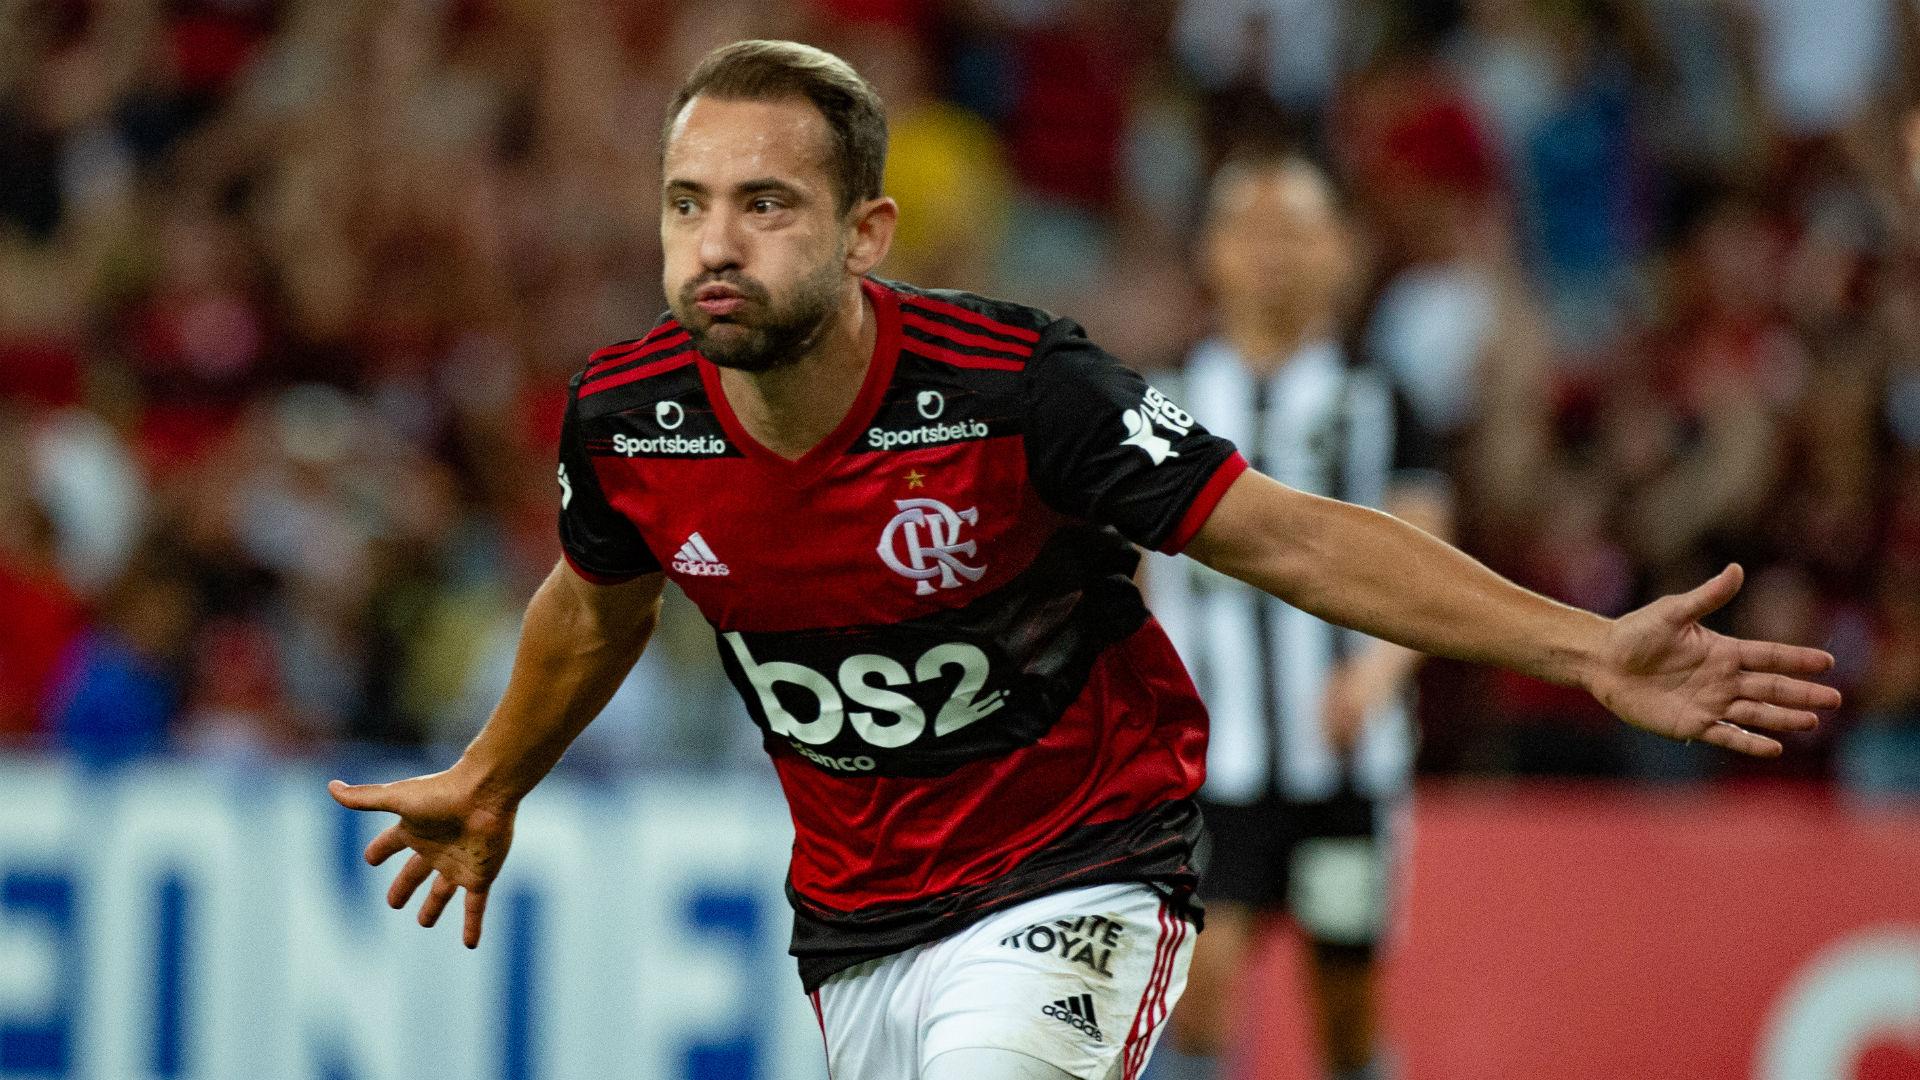 Meia do Flamengo